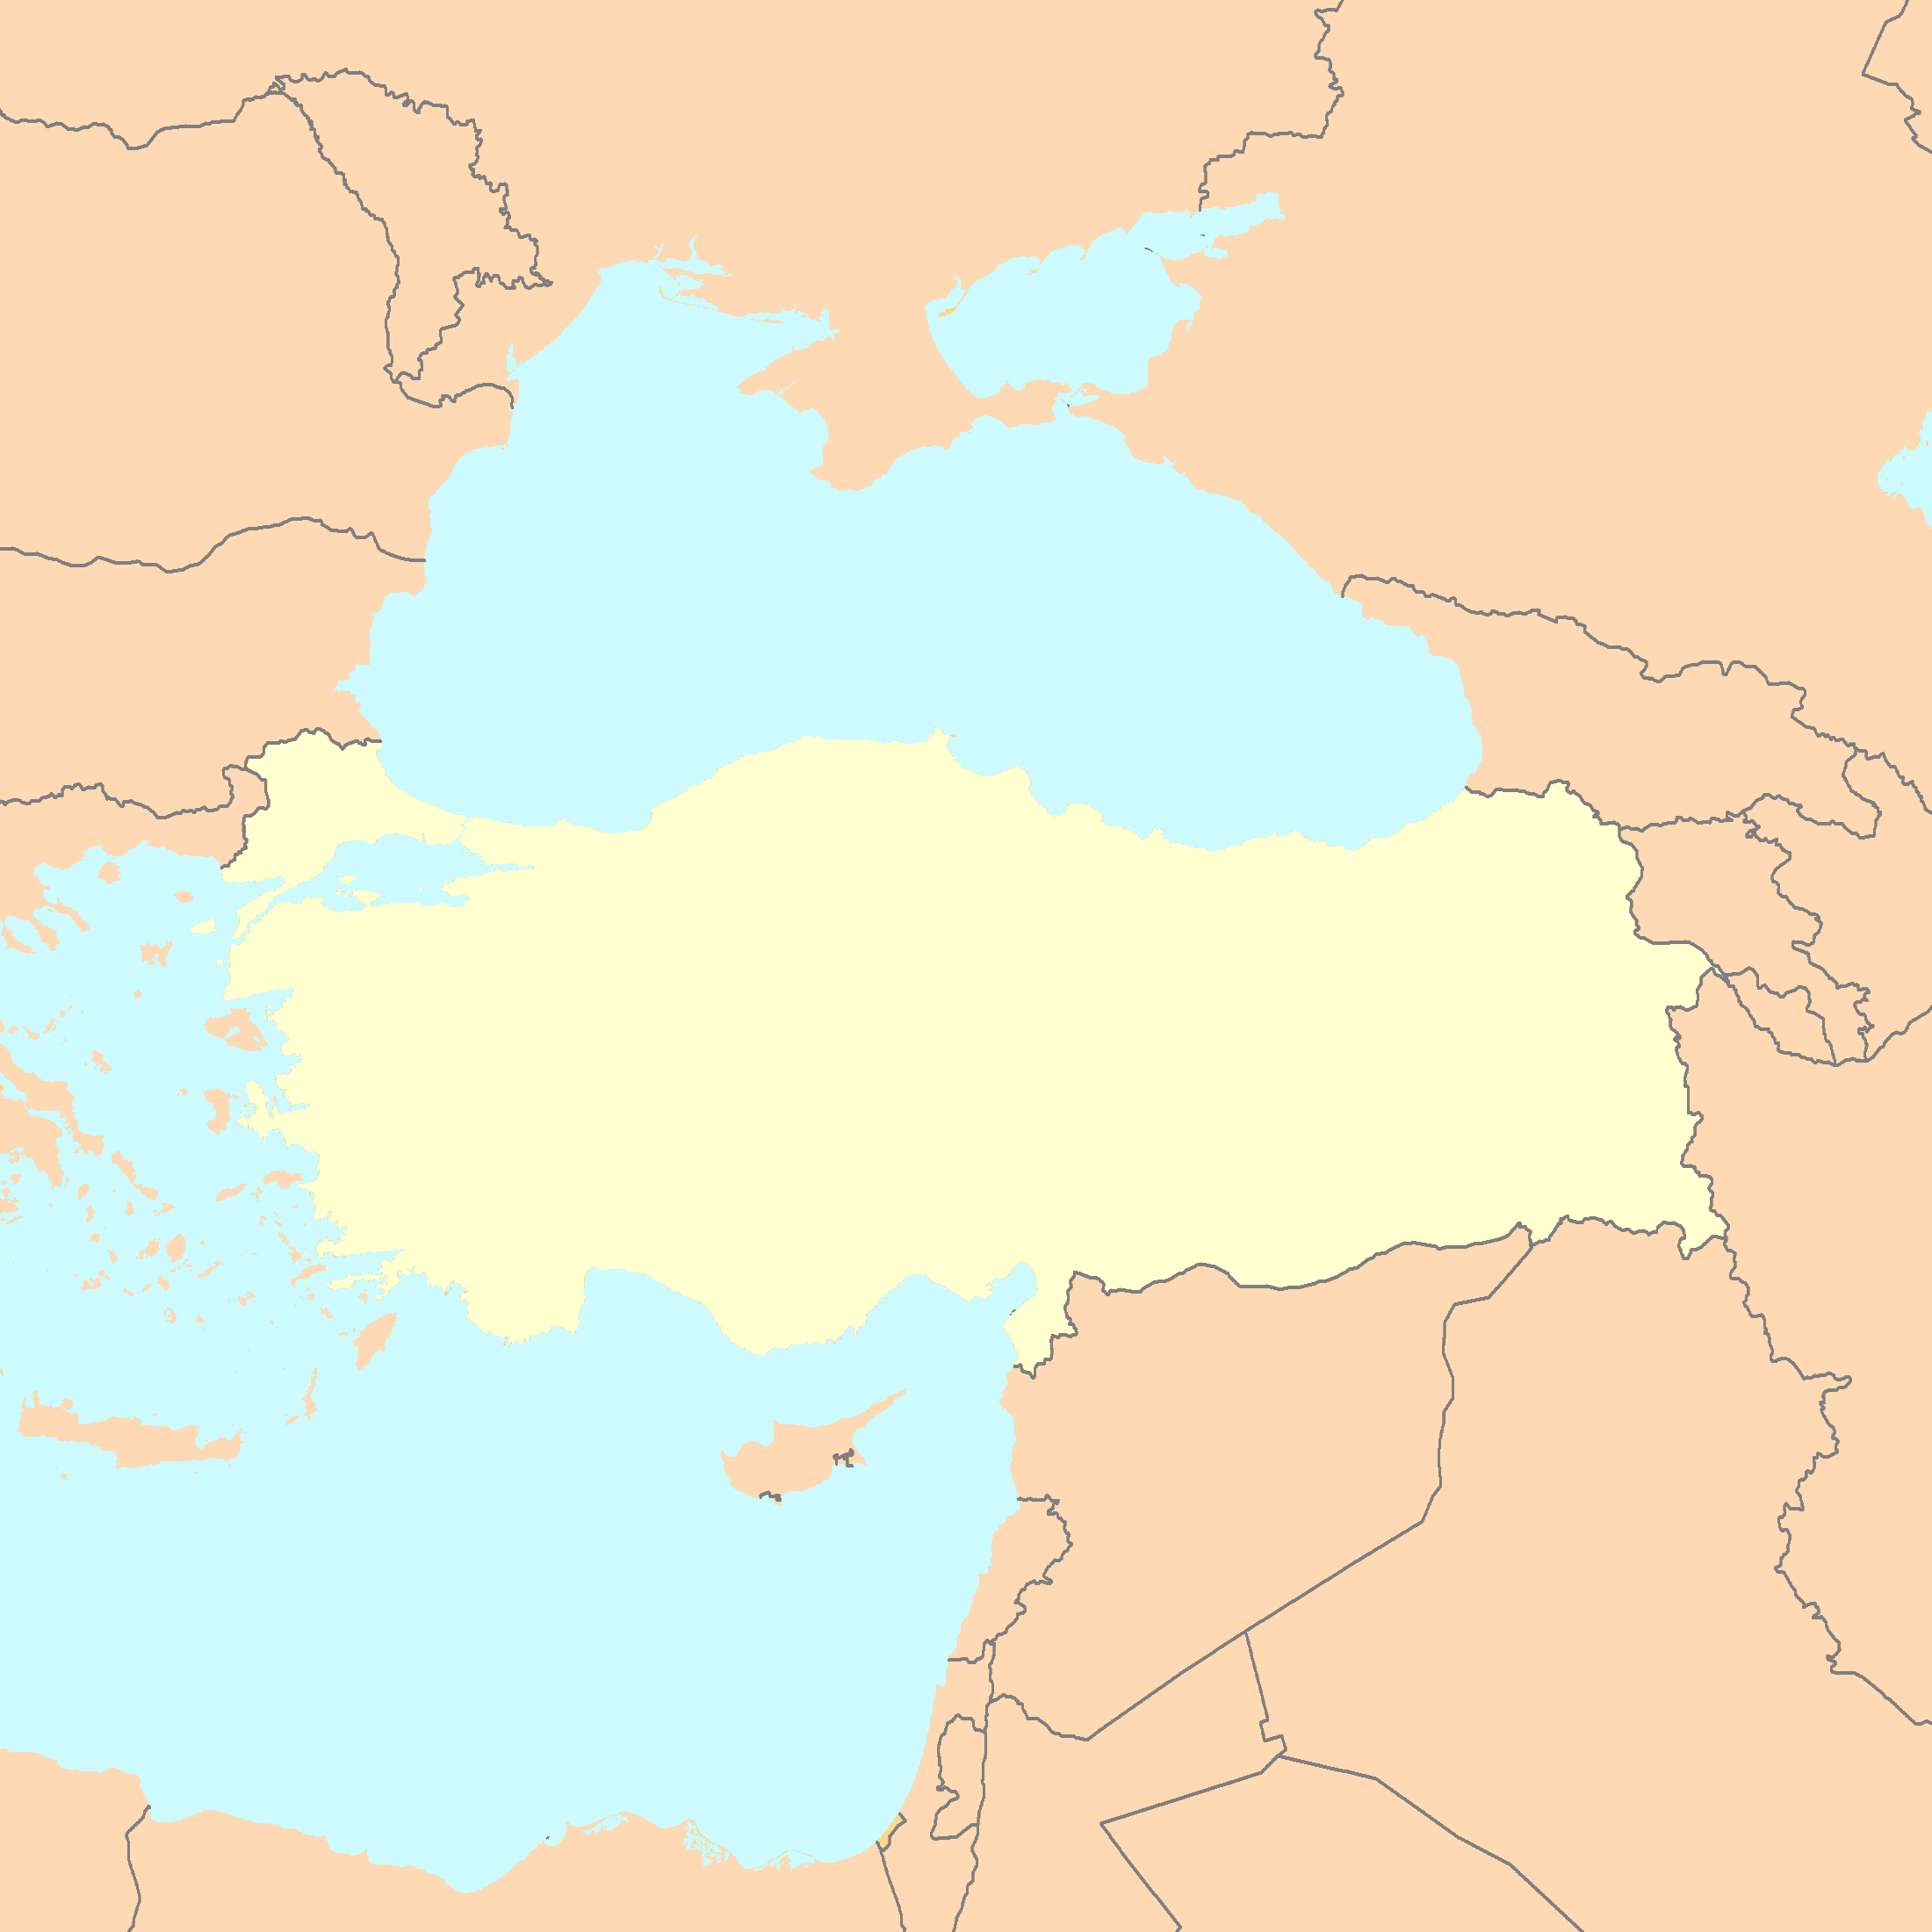 Fileturkey map blankpng wikimedia commons for Blank turkey